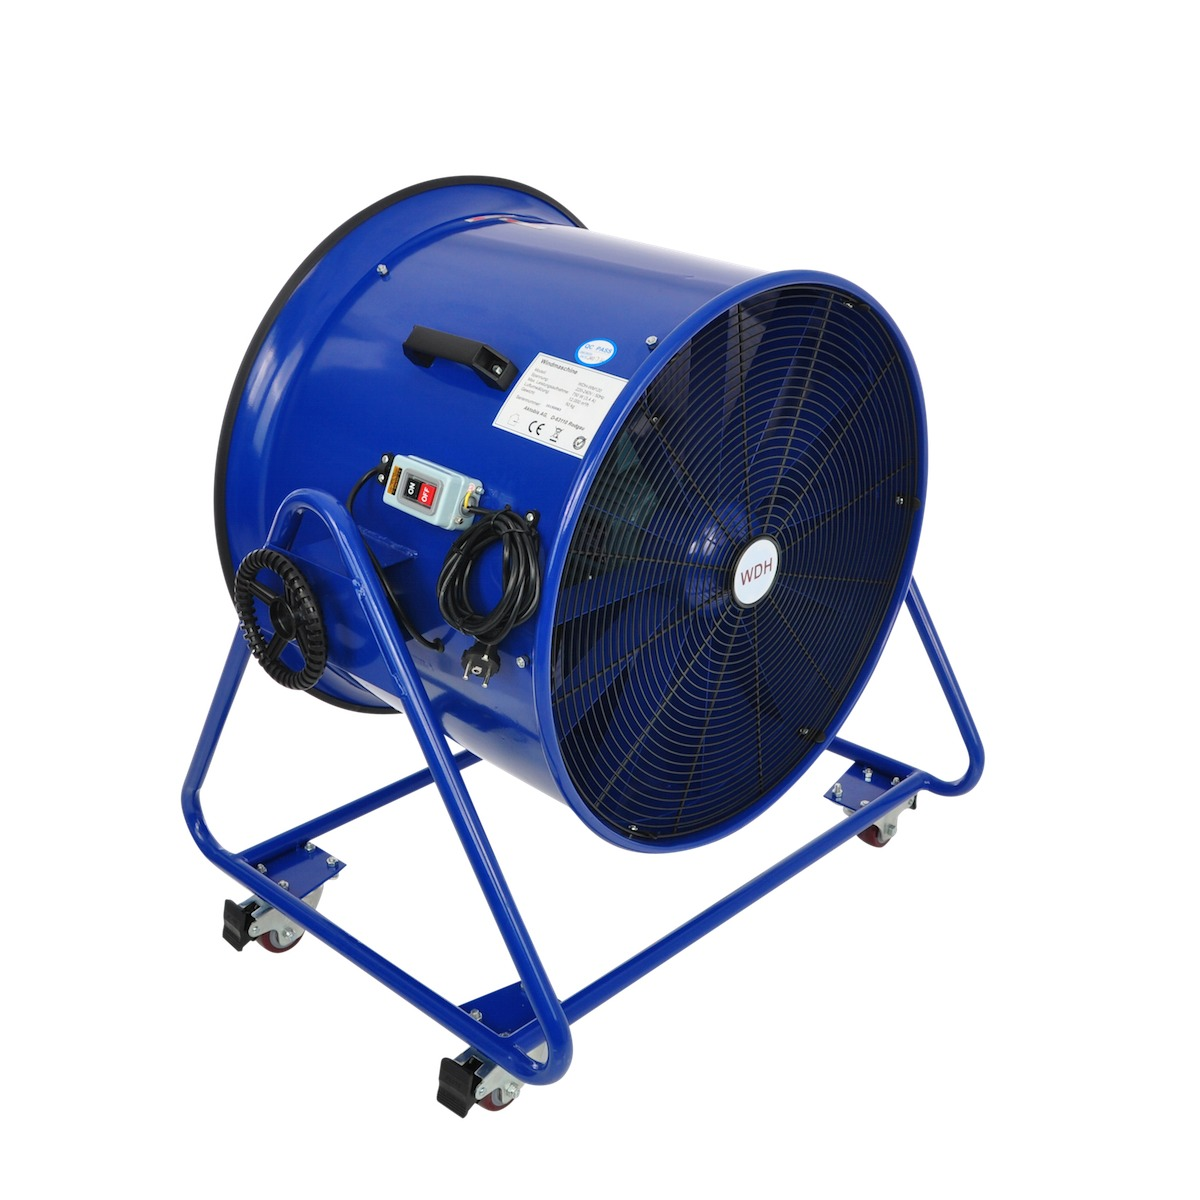 Windmaschine WDH-WM120 blau